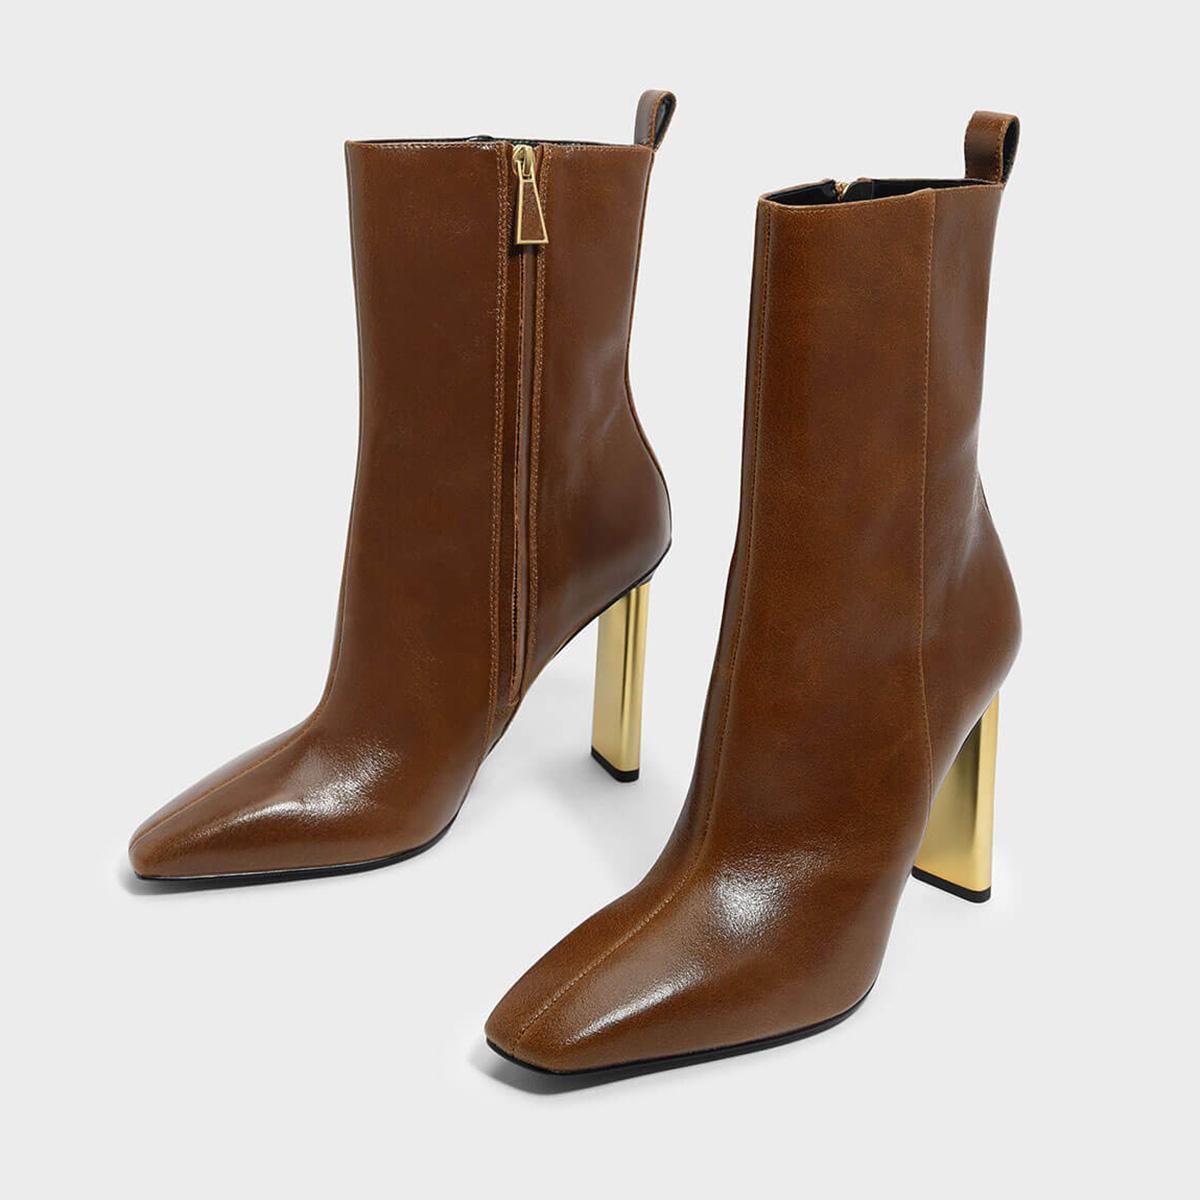 best-brown-boots-269008-1538406052337-main.1200x0c.jpg (1200×1200)